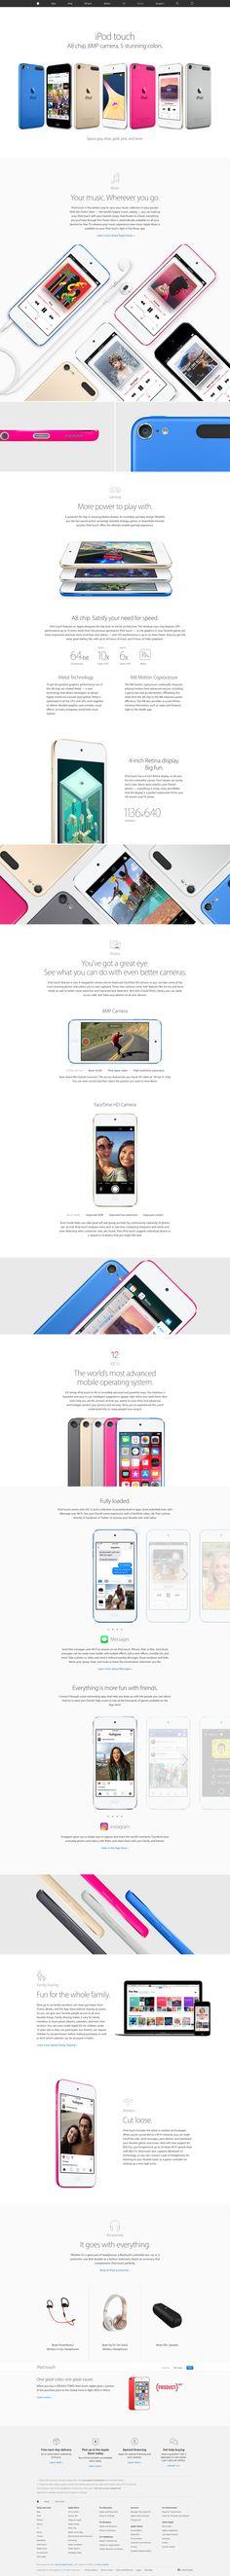 Apple Commercial, Ipod Touch, Desktop Screenshot